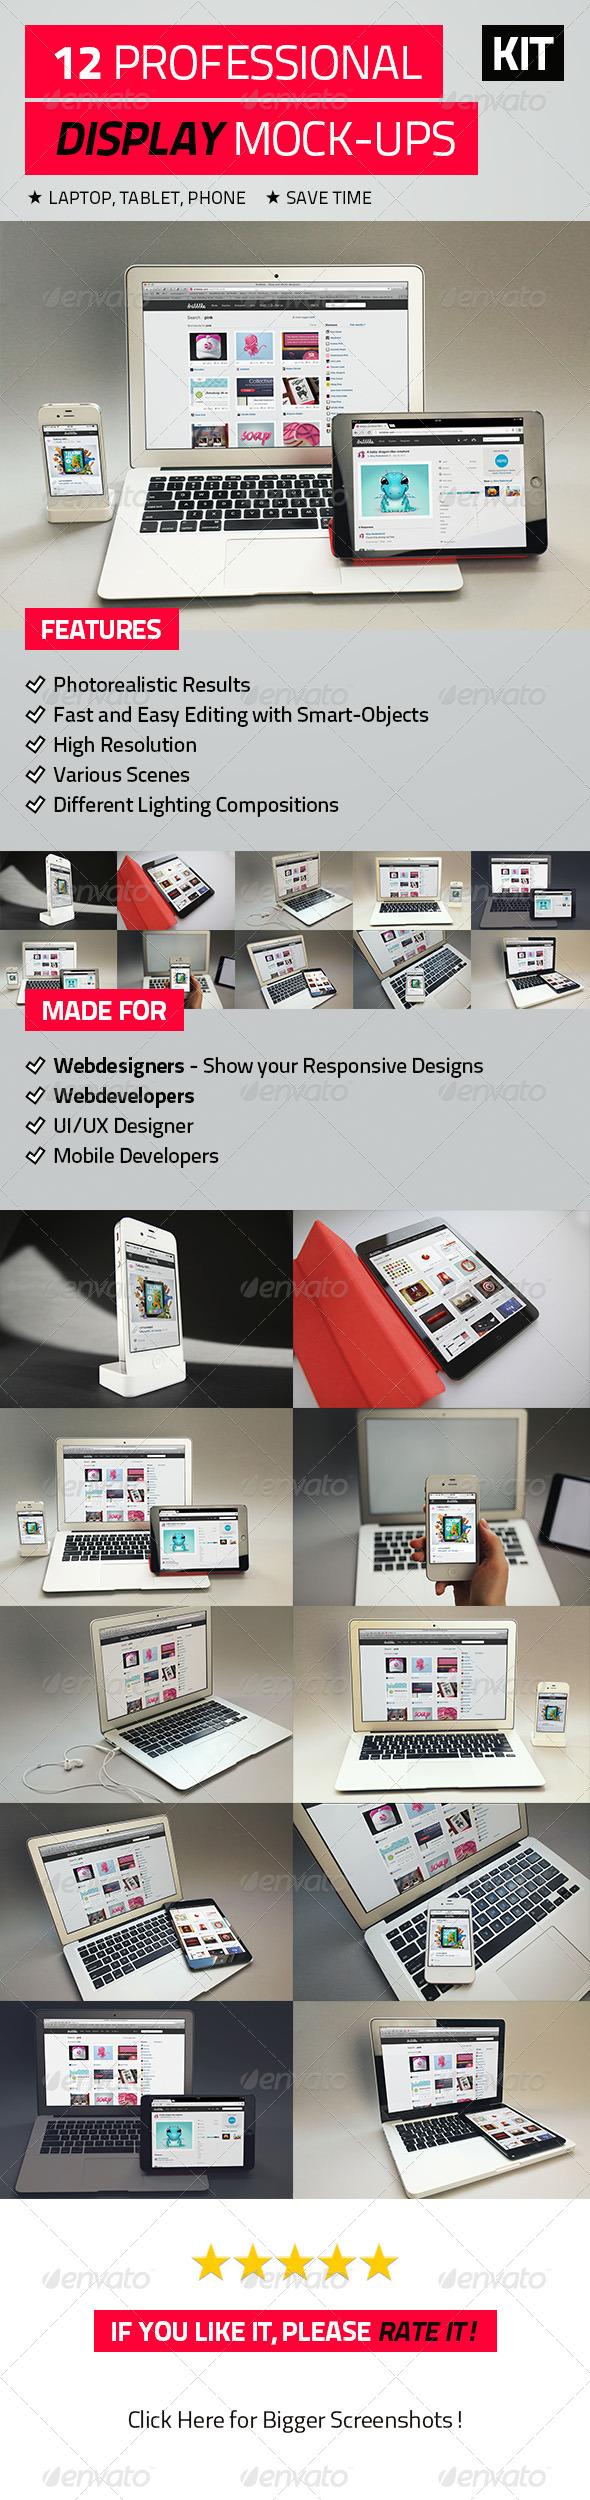 GraphicRiver 12 Professional Display Mock-Ups 5135990